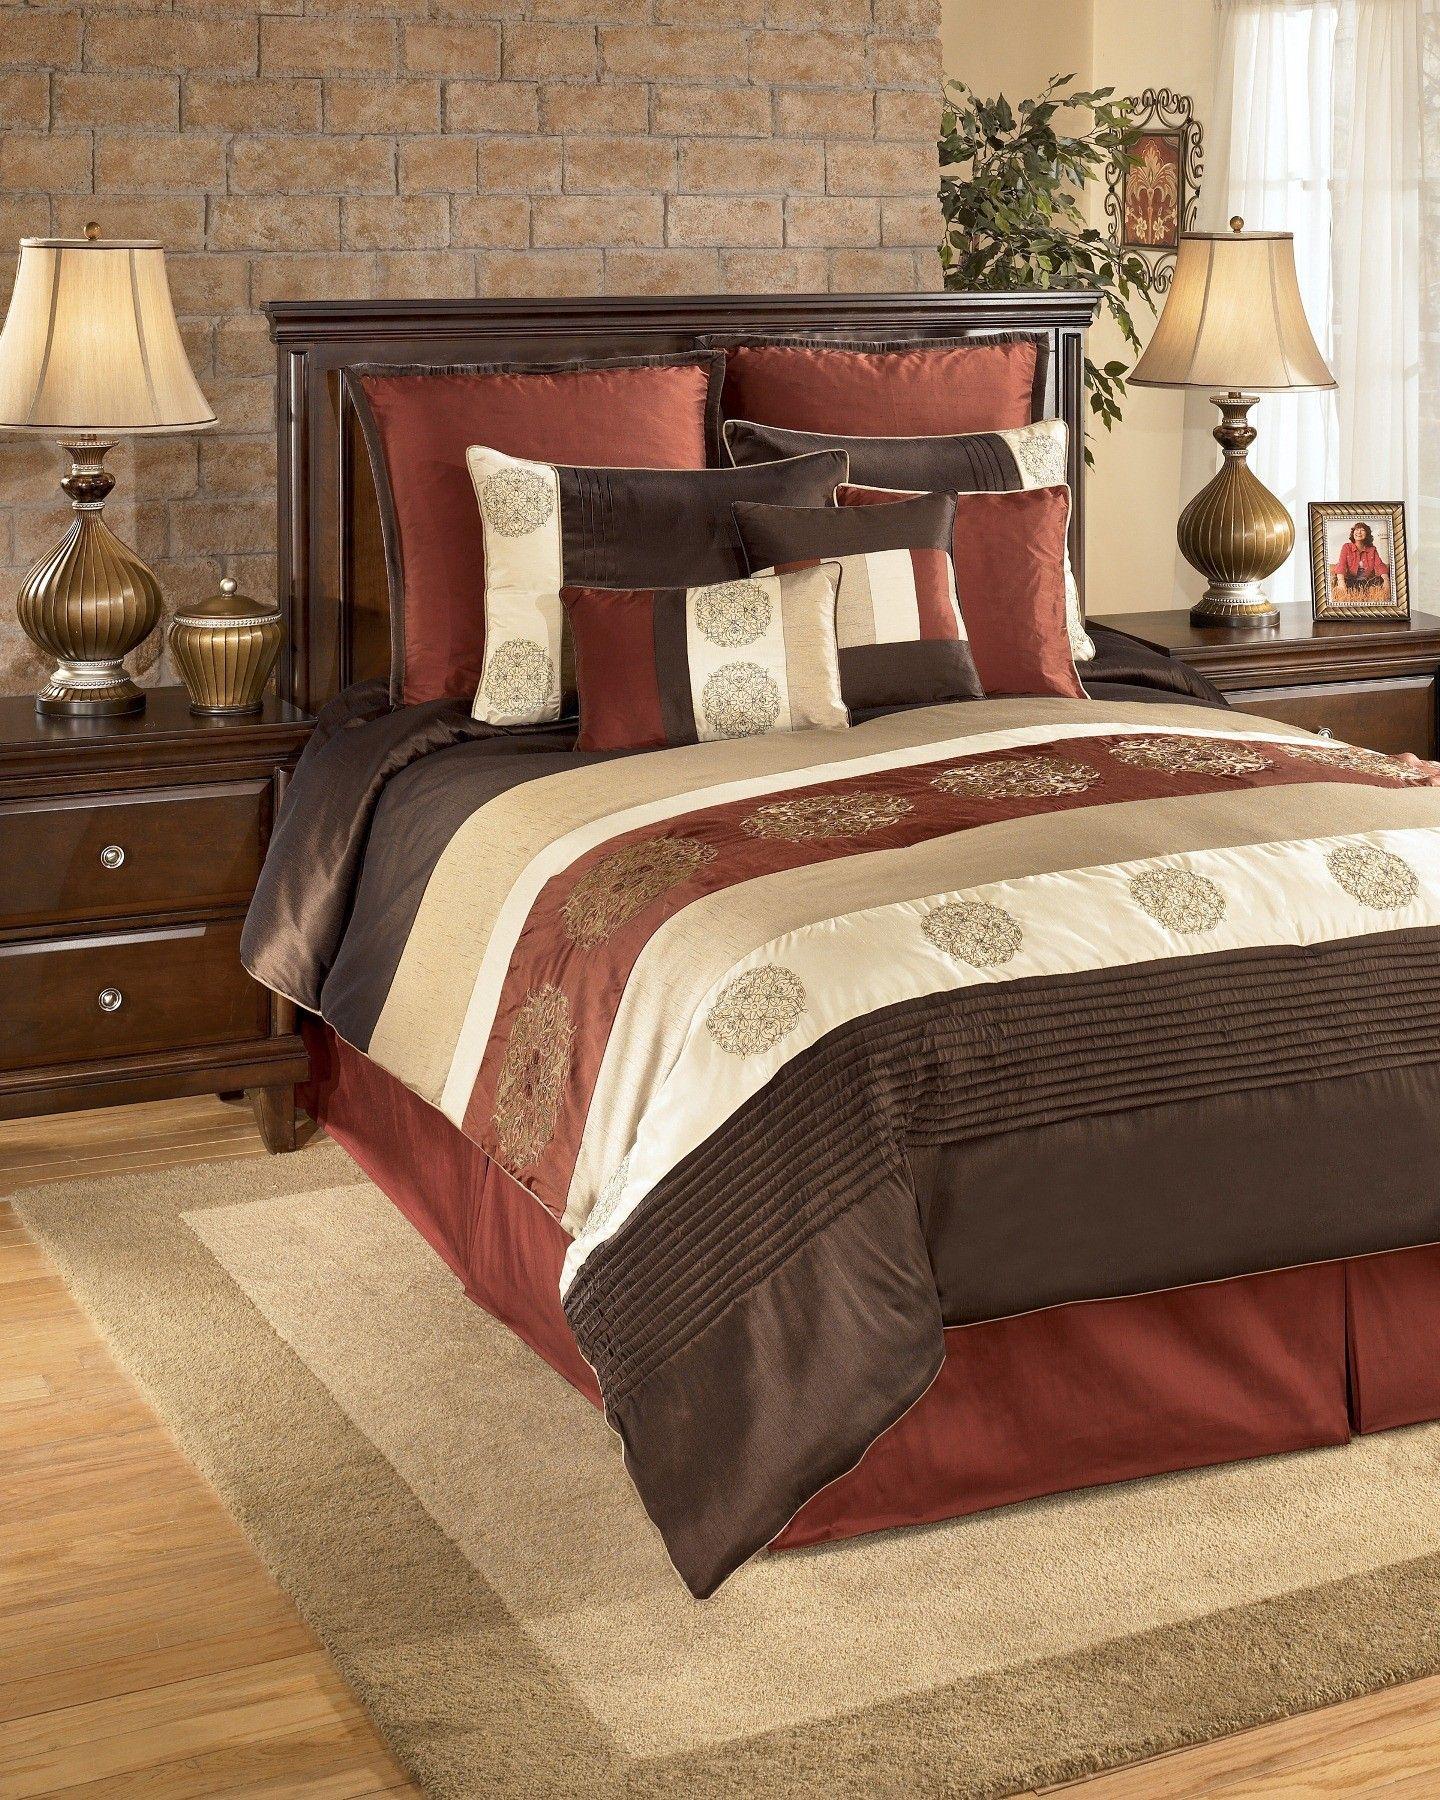 broyhill sofa nebraska furniture mart coasters oversized king size bedding 126x120 milano russett